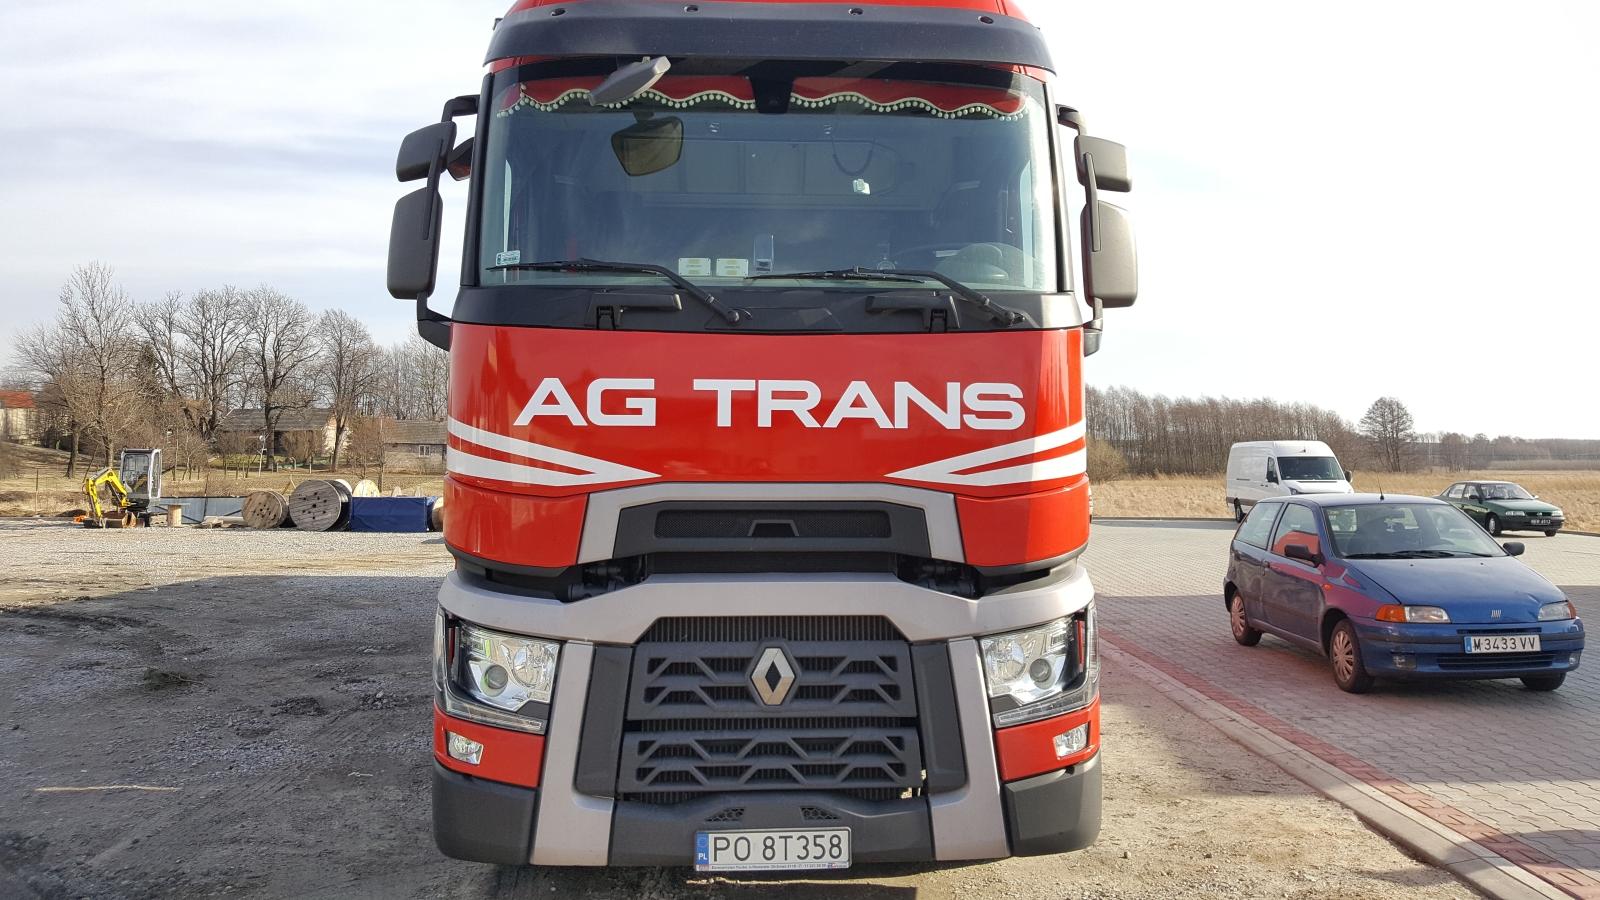 AGTrans_07